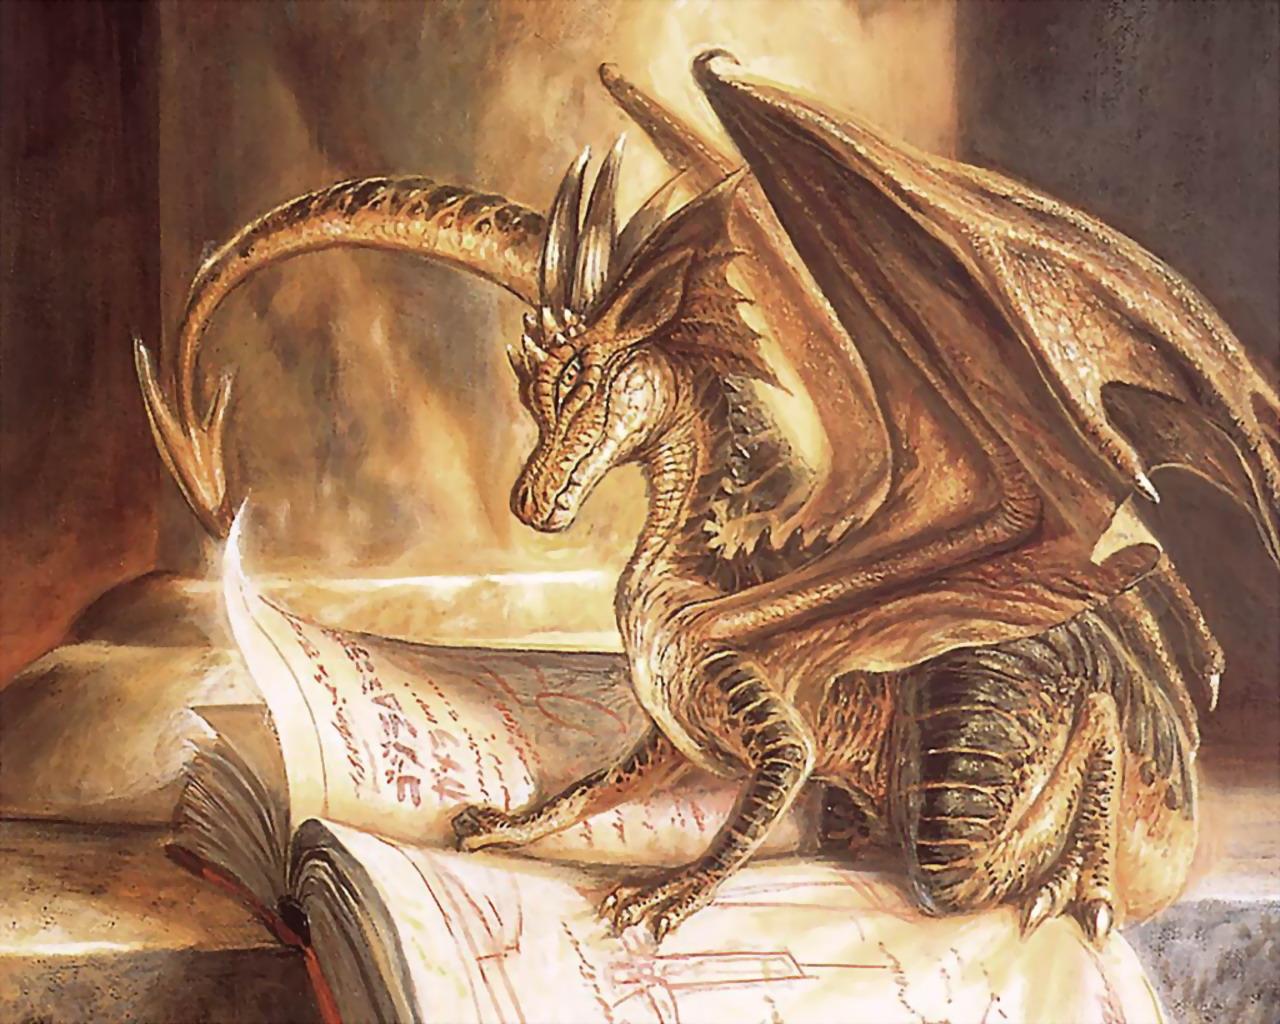 Top ten dragon anime http www dragon zoo com dragons dragon anime top ten dragon anime html fairy tail wiki dragon http fairytail wikia com wiki